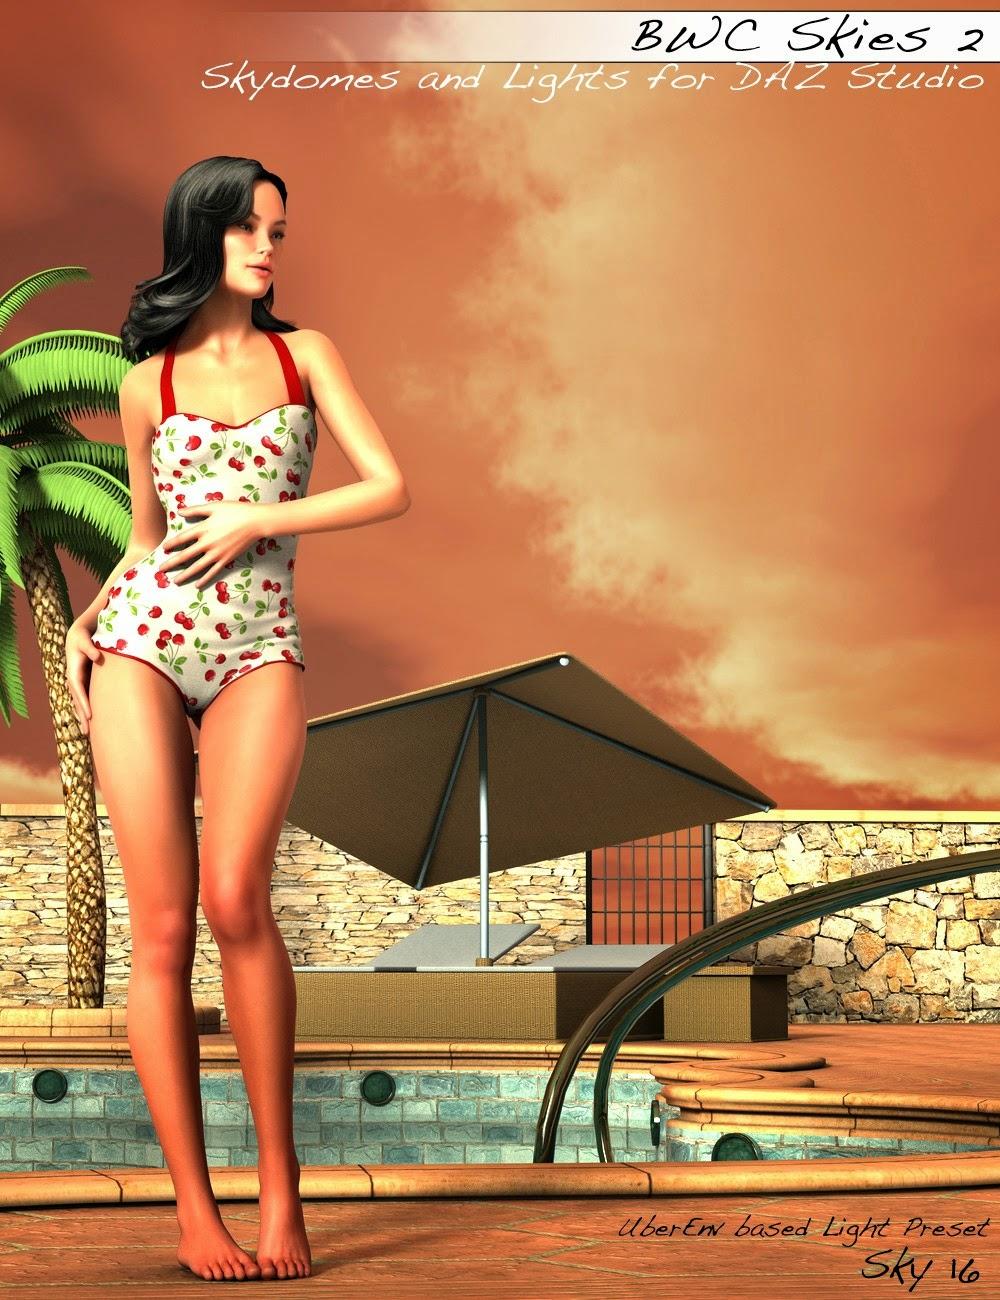 3d Models - BWC Skies 2